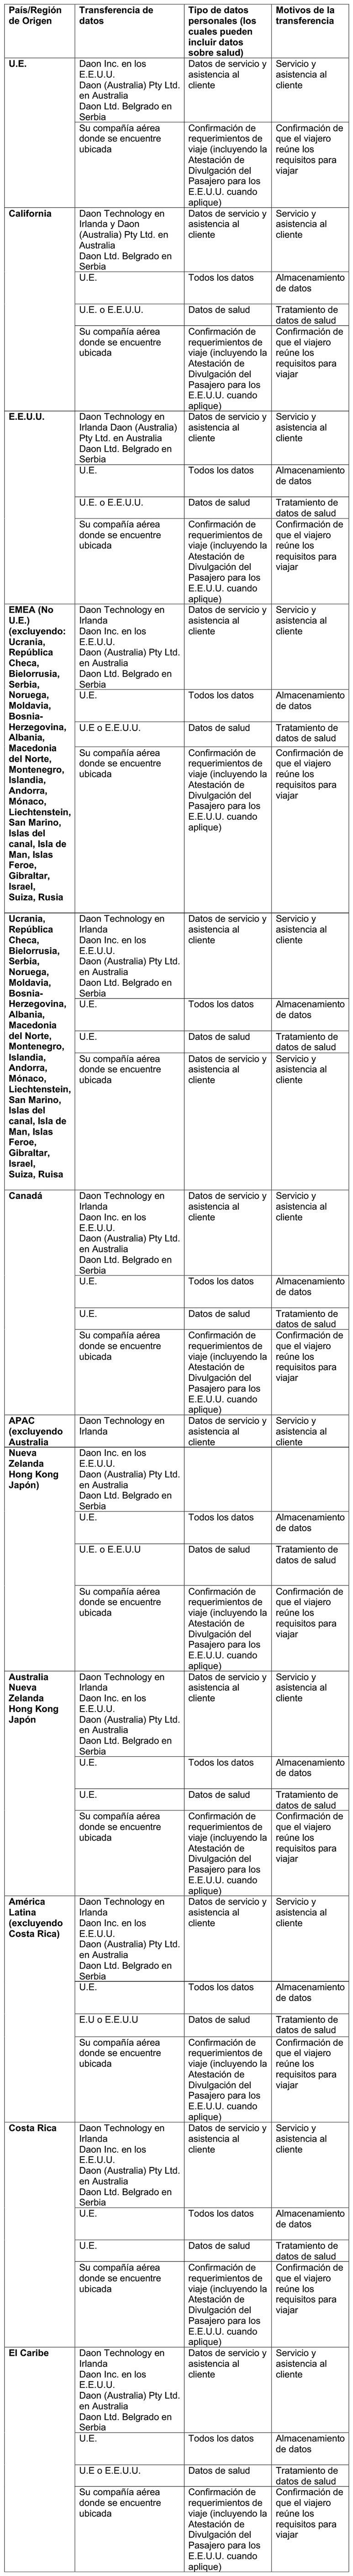 Privacy-022521-4-Spanish